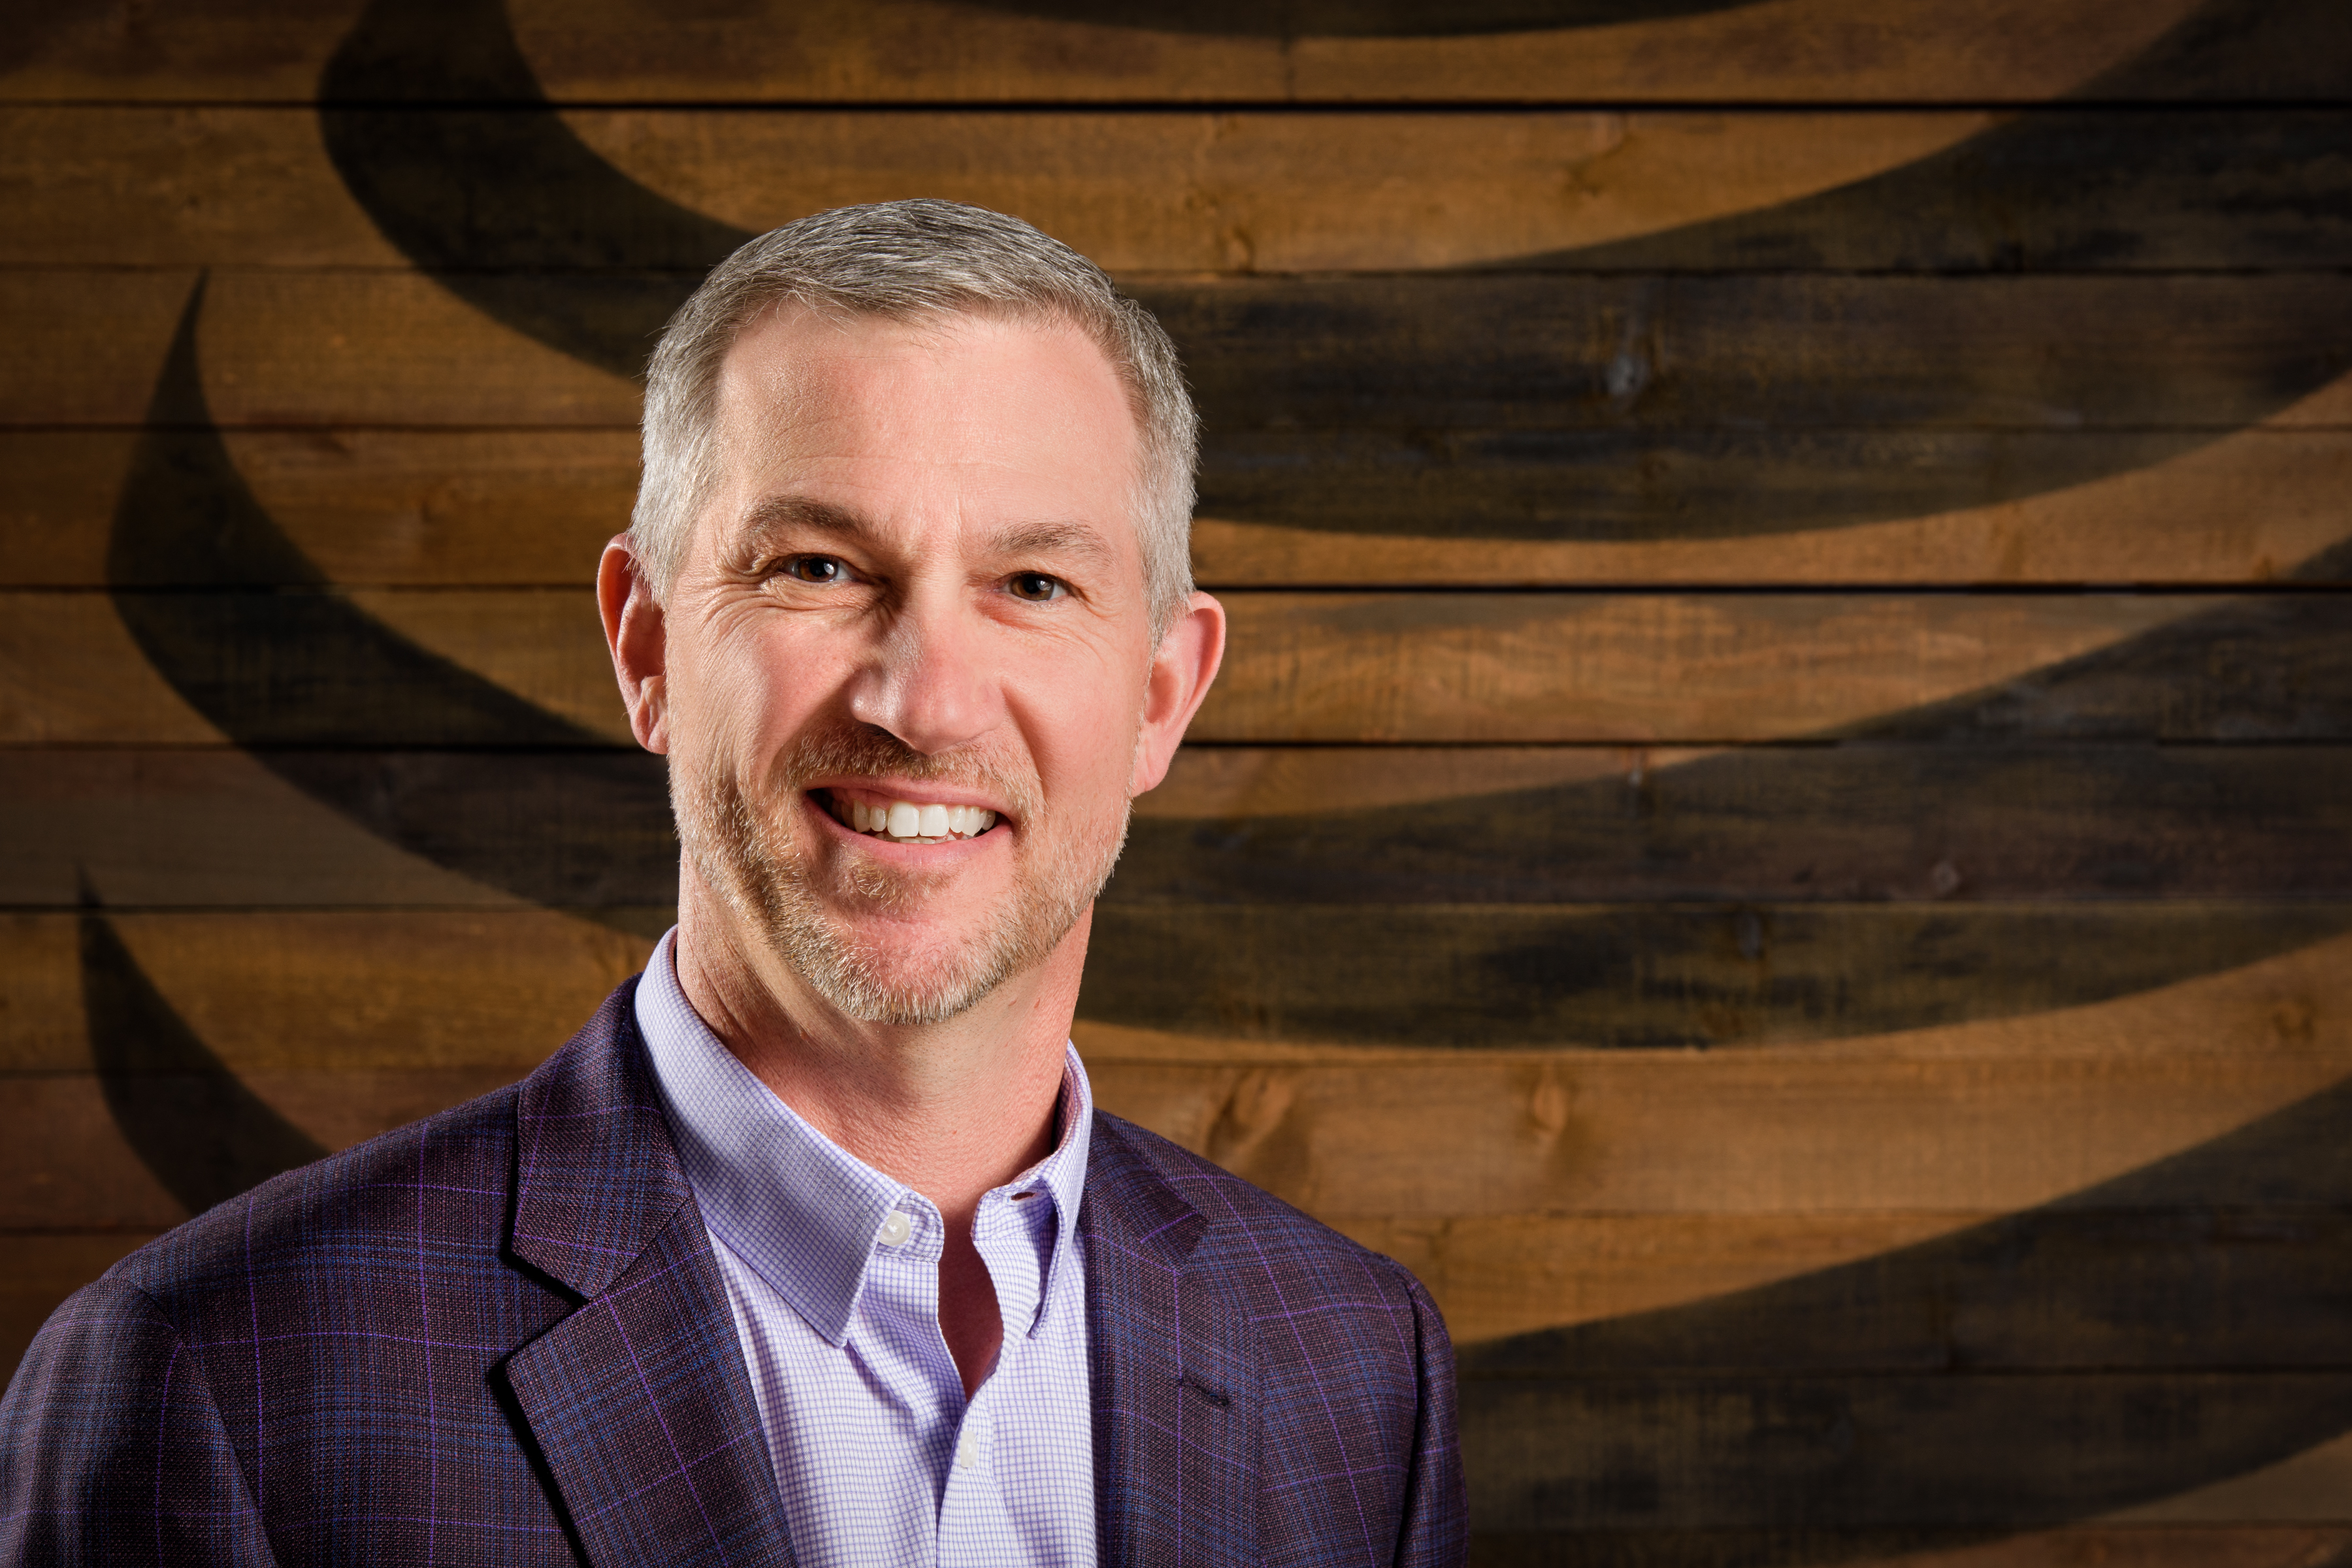 Jeff McElfresh